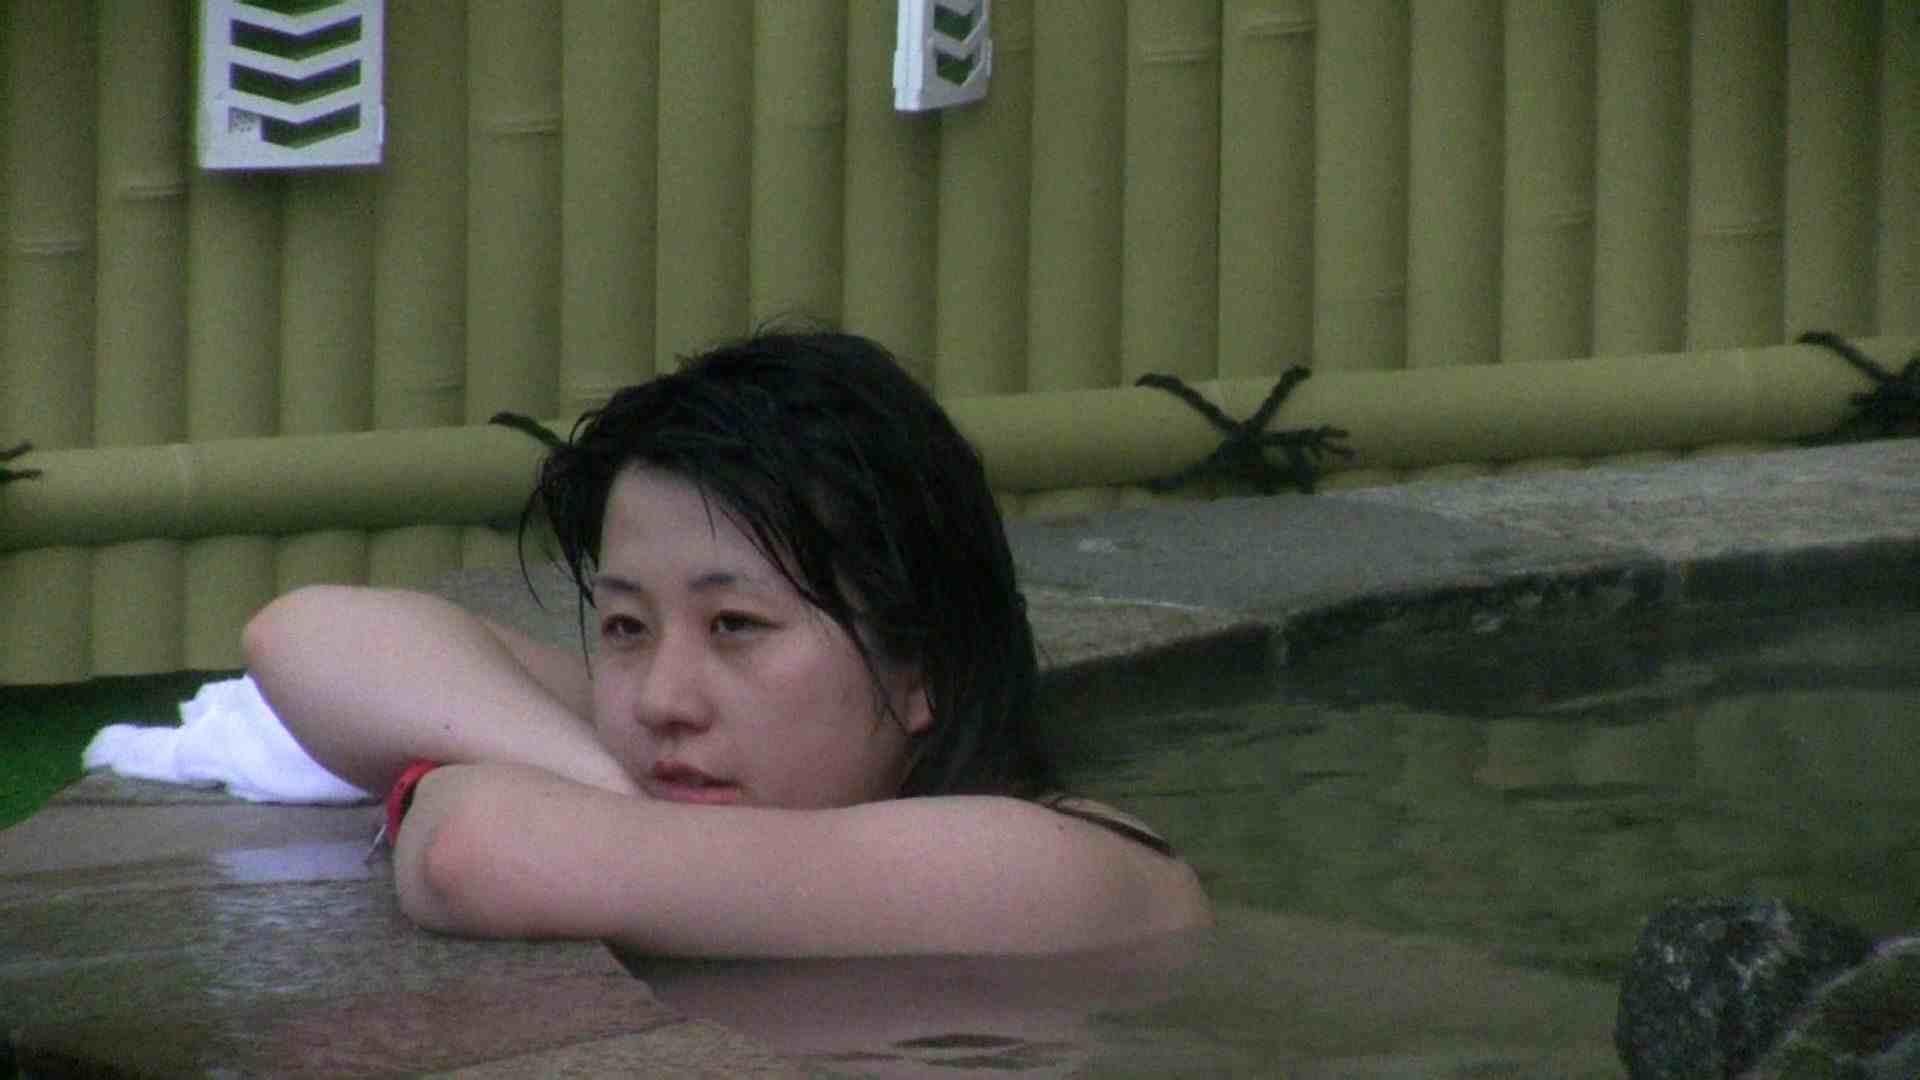 Aquaな露天風呂Vol.541 露天風呂編 | 盗撮シリーズ  88PIX 45